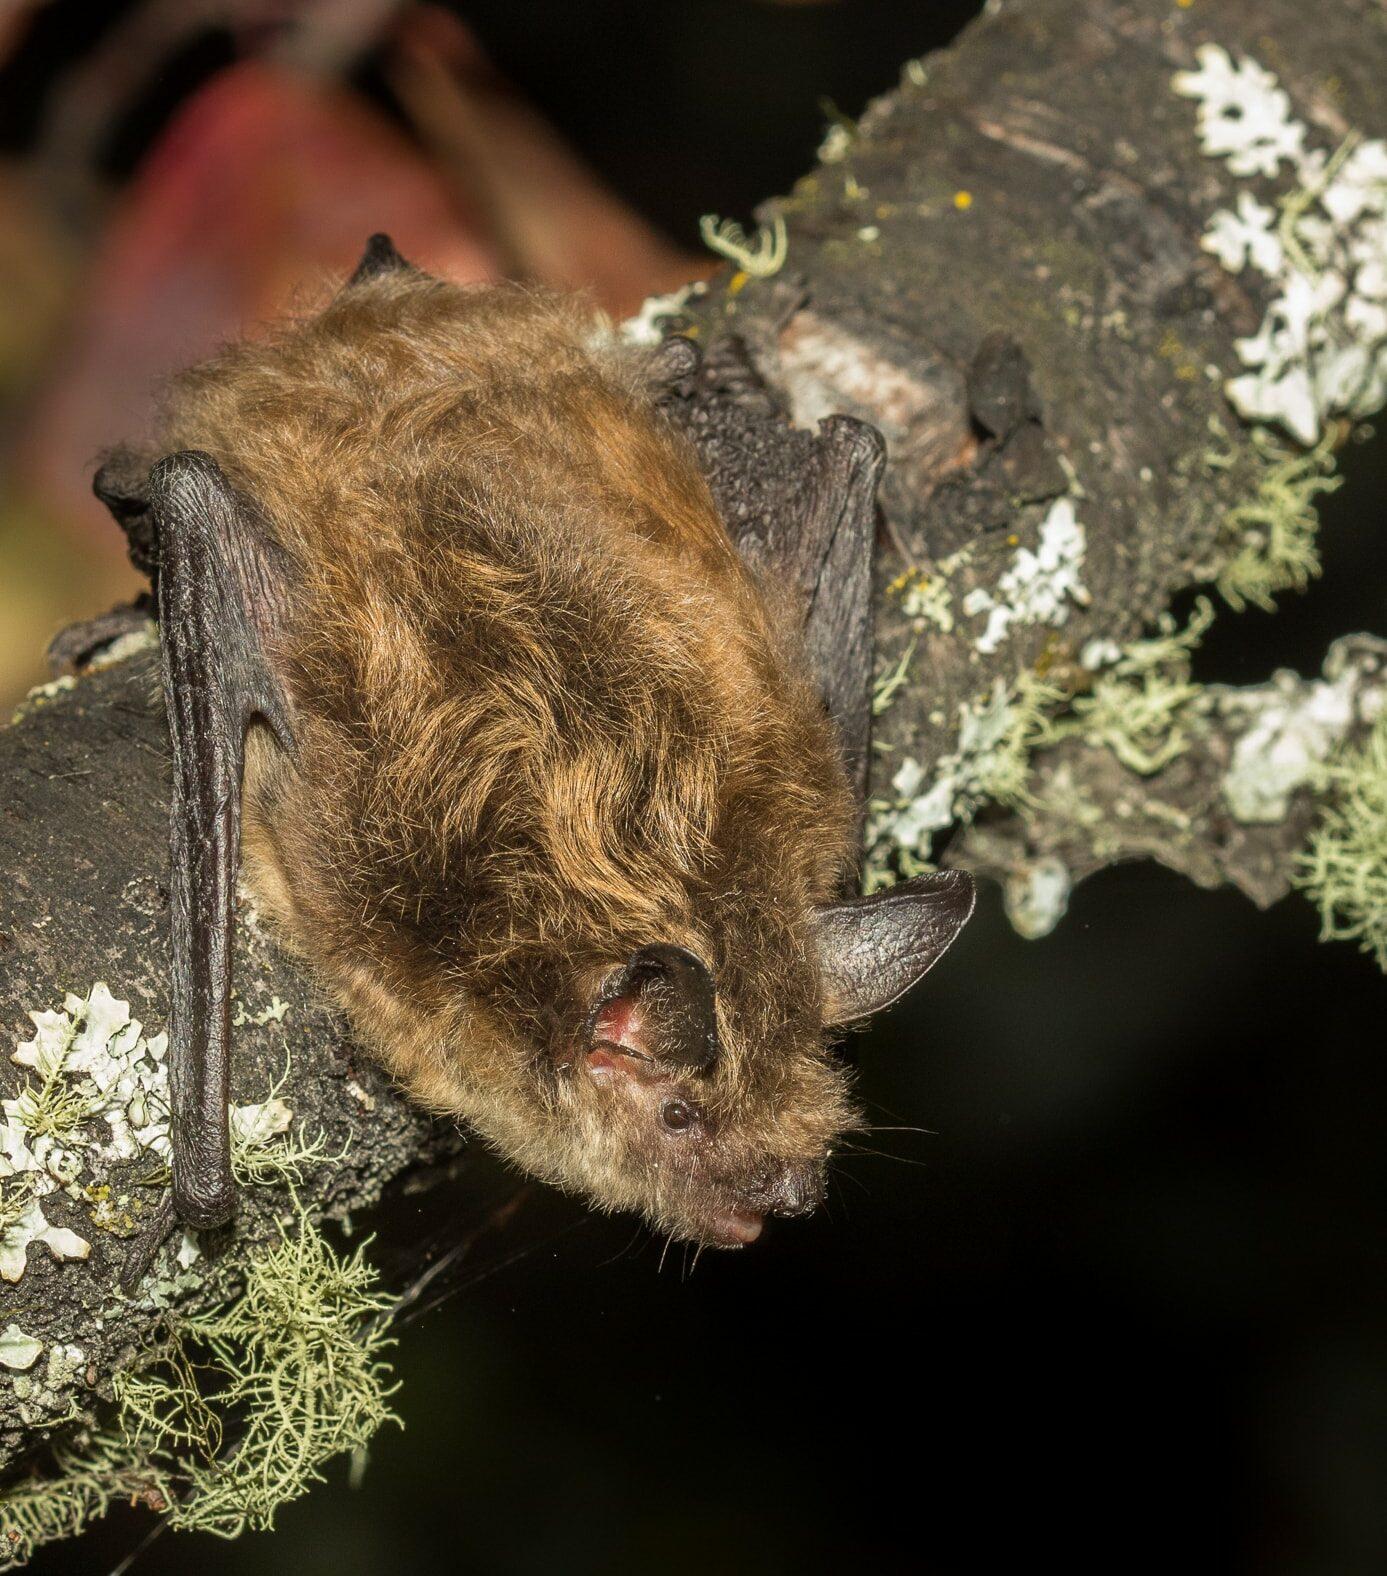 Endangered little brown myotis bat